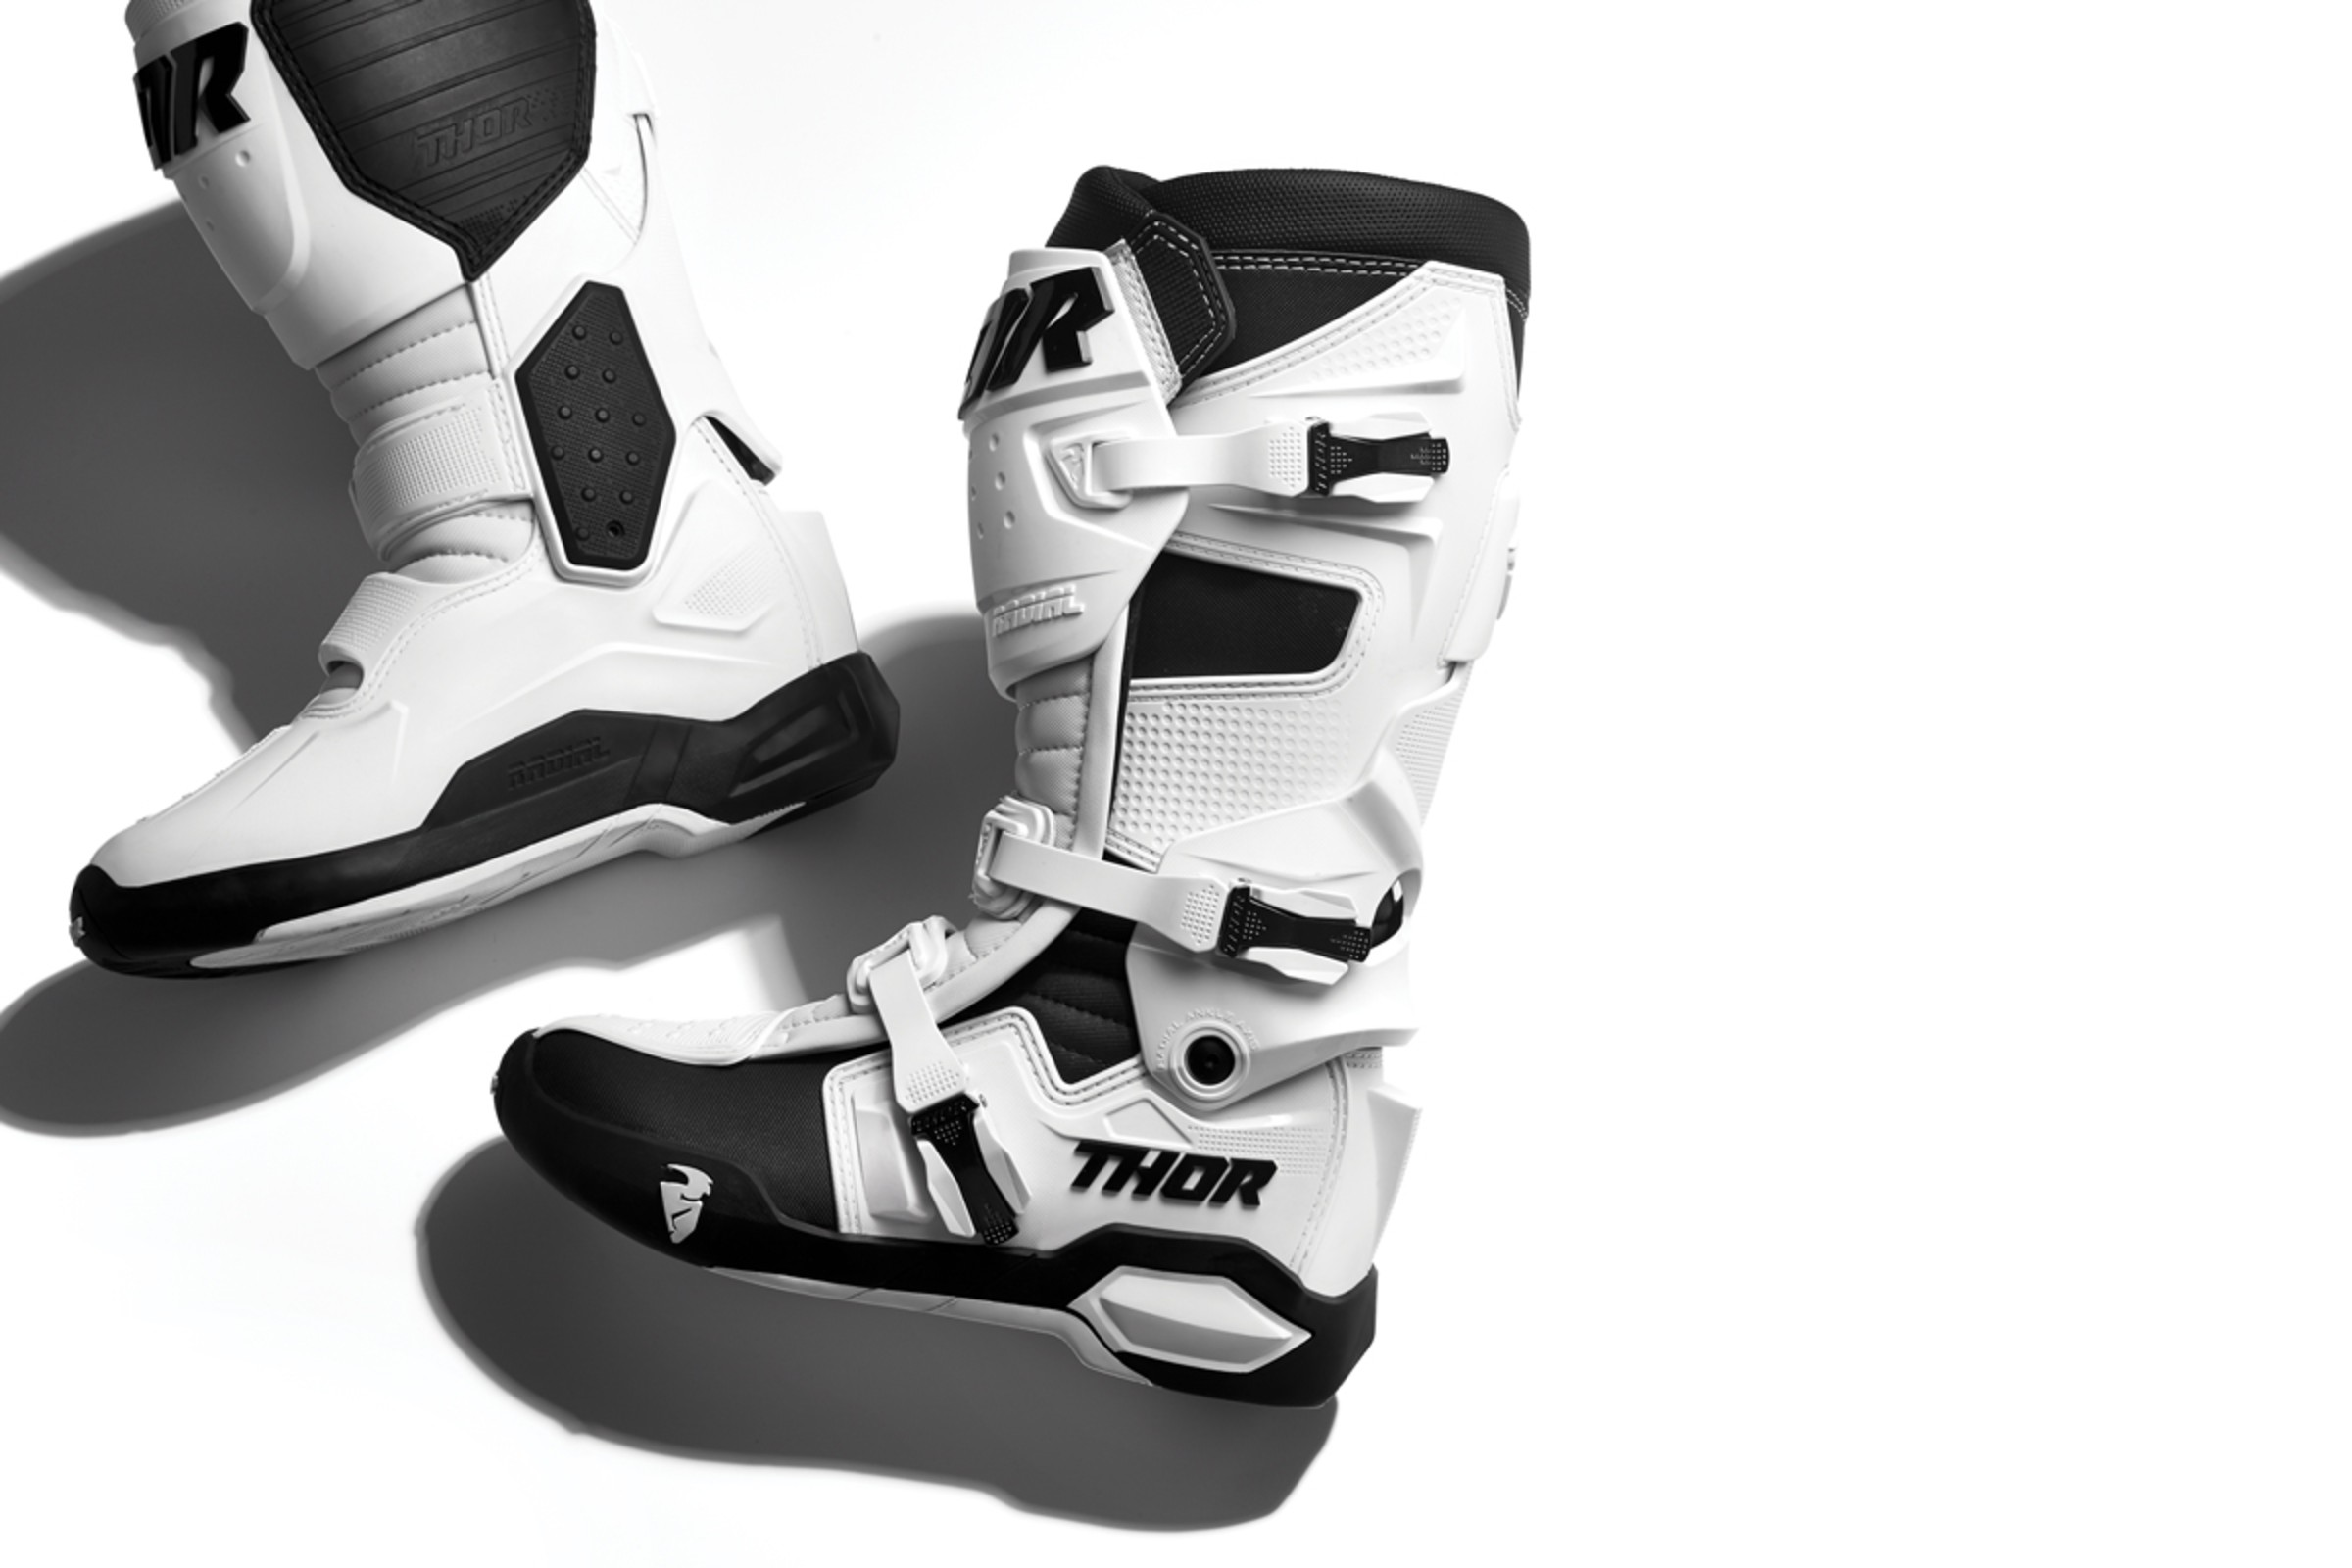 New Boot Online Releases All Radial Racer X Thor Mx CtsQxBrdh